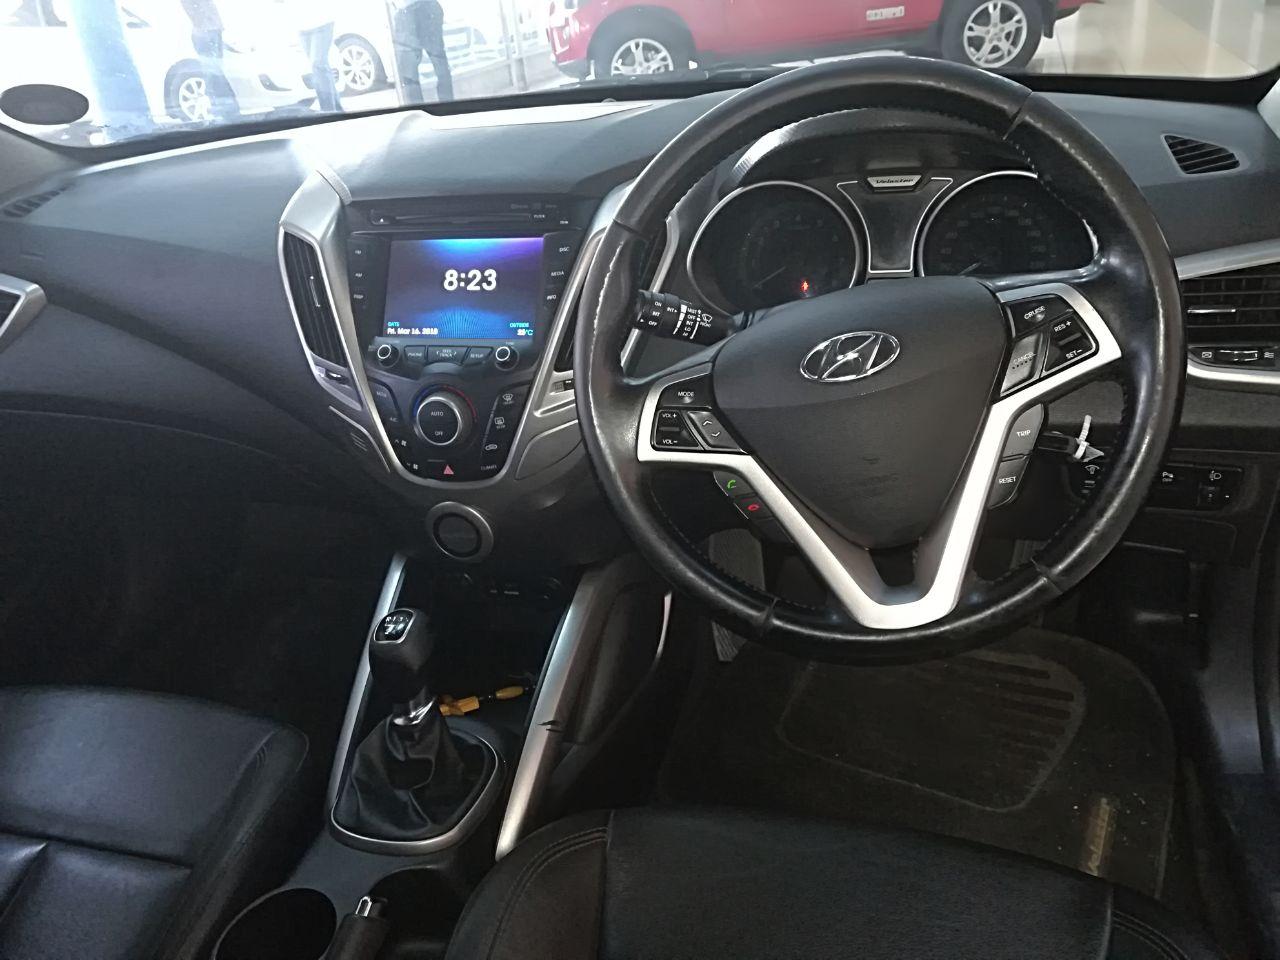 Hyundai Veloster 1.6 GDI Executive DCT